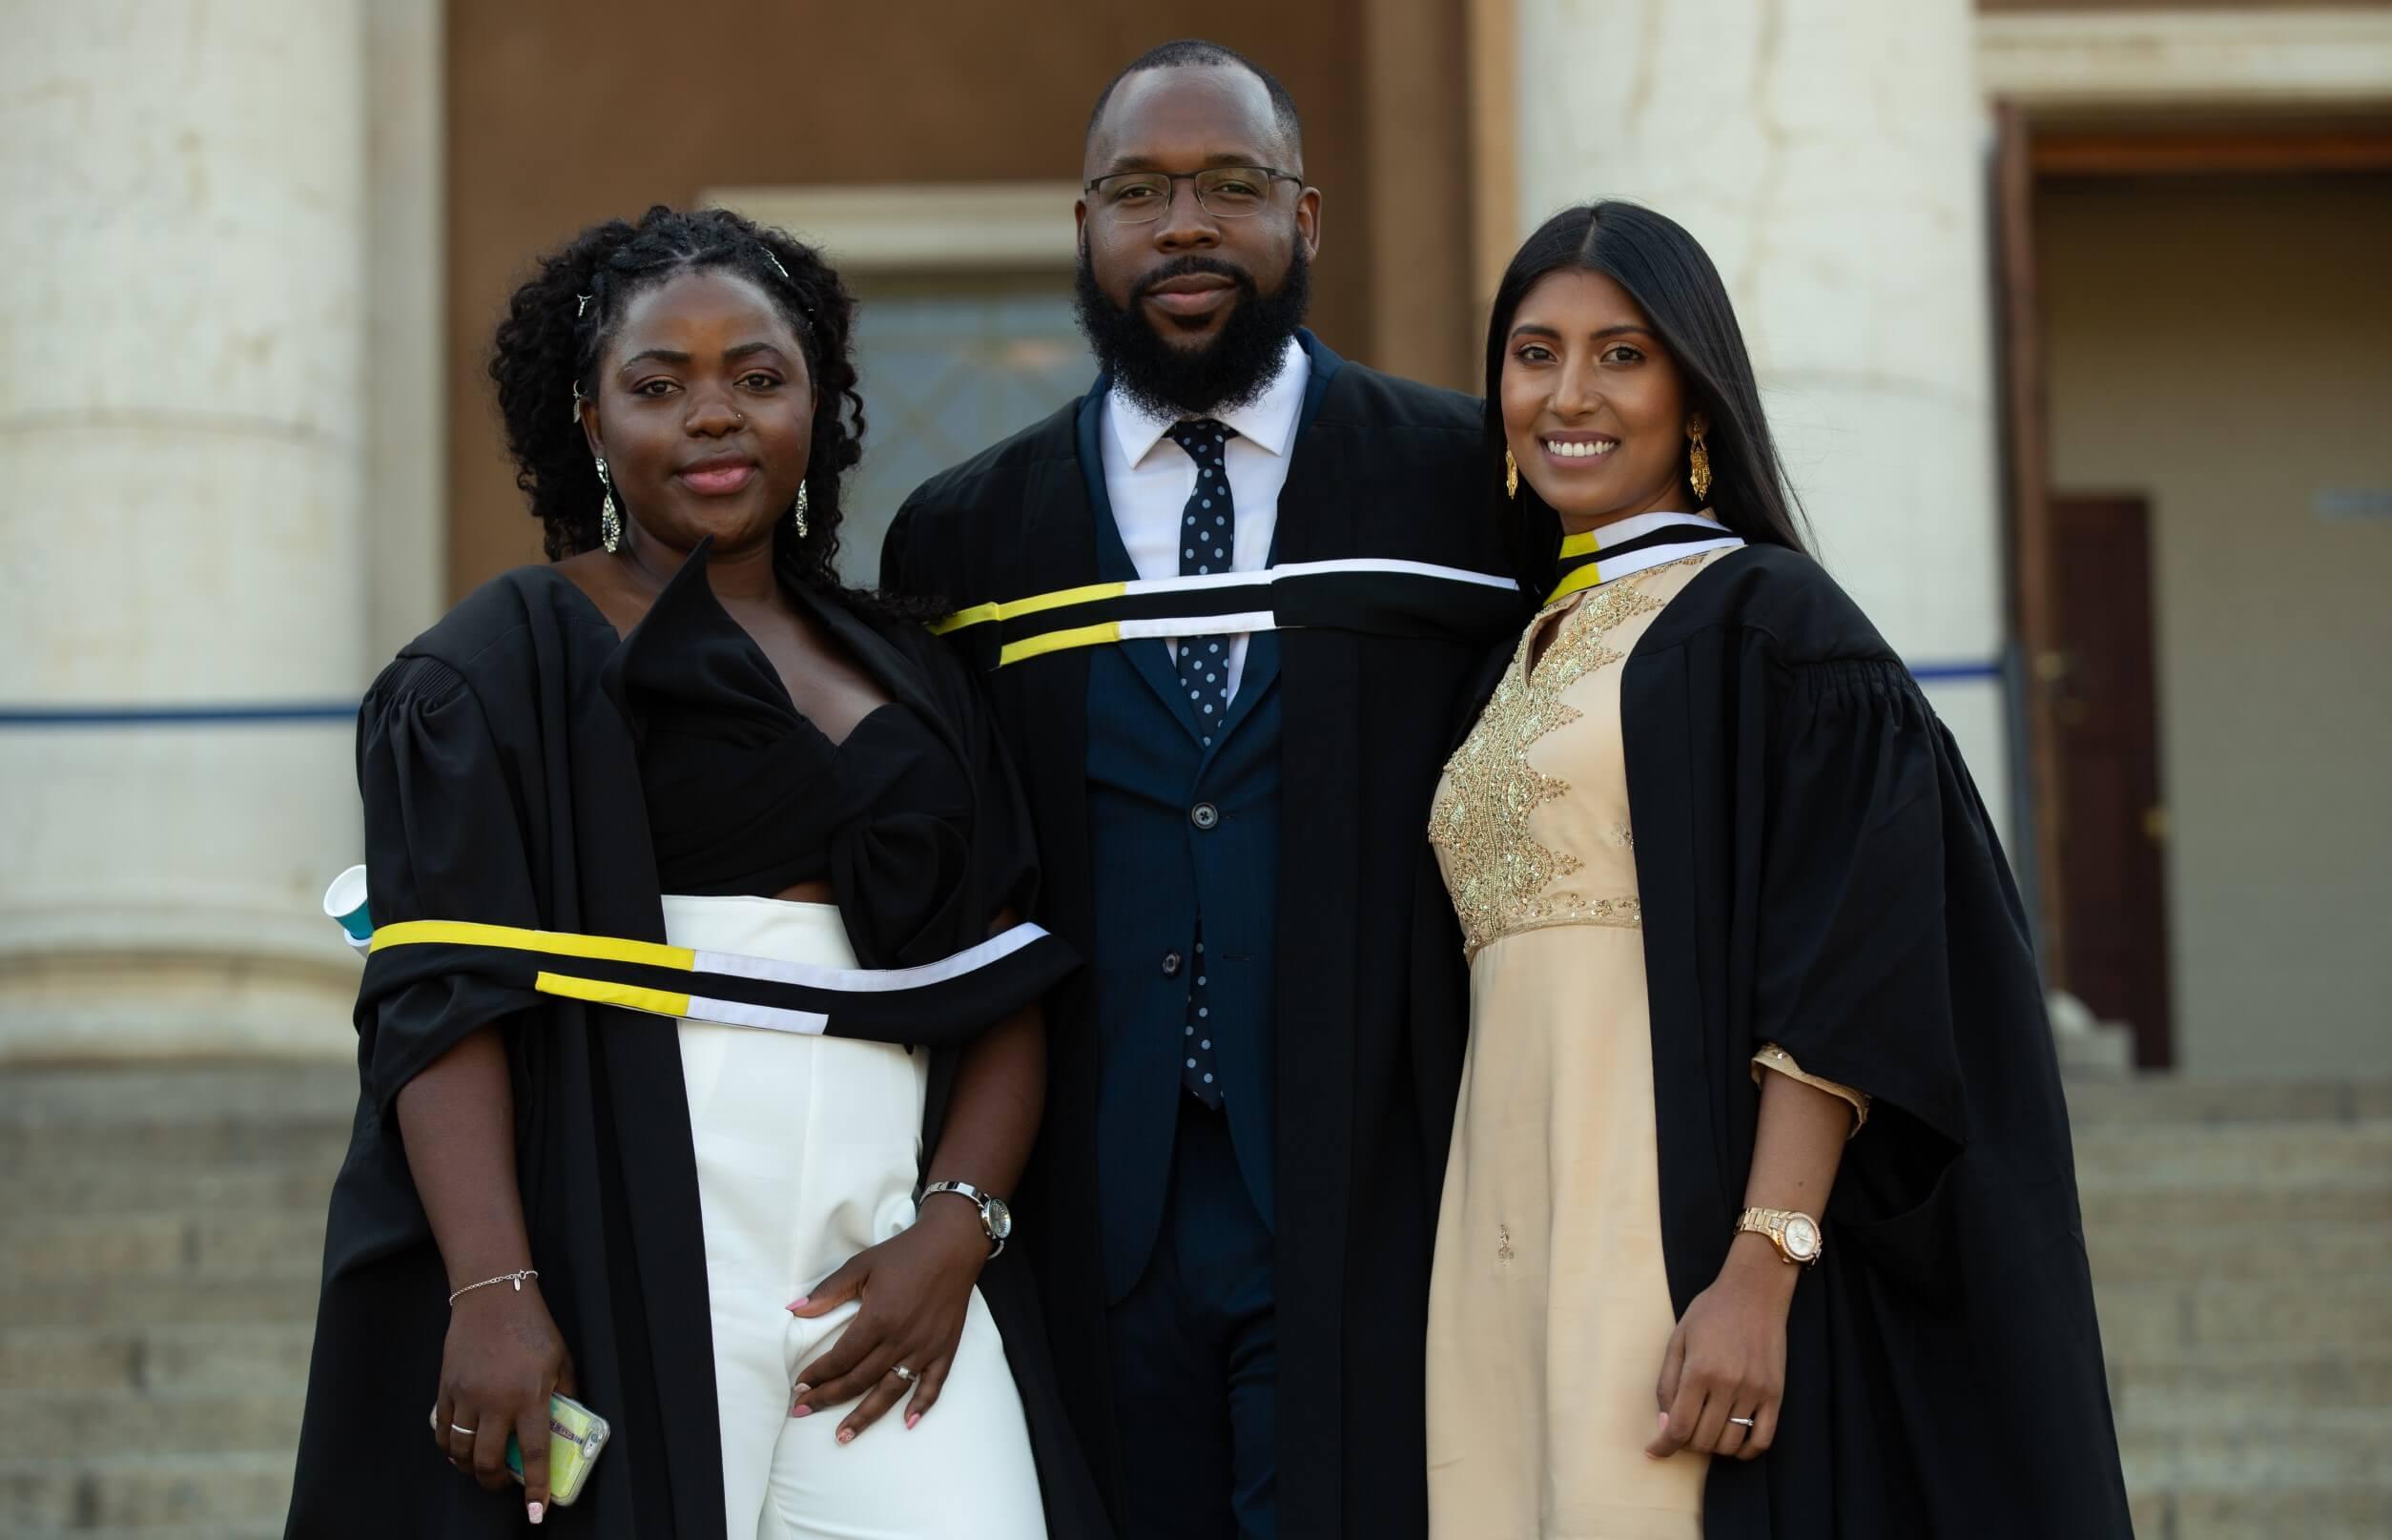 Alumni - benefit